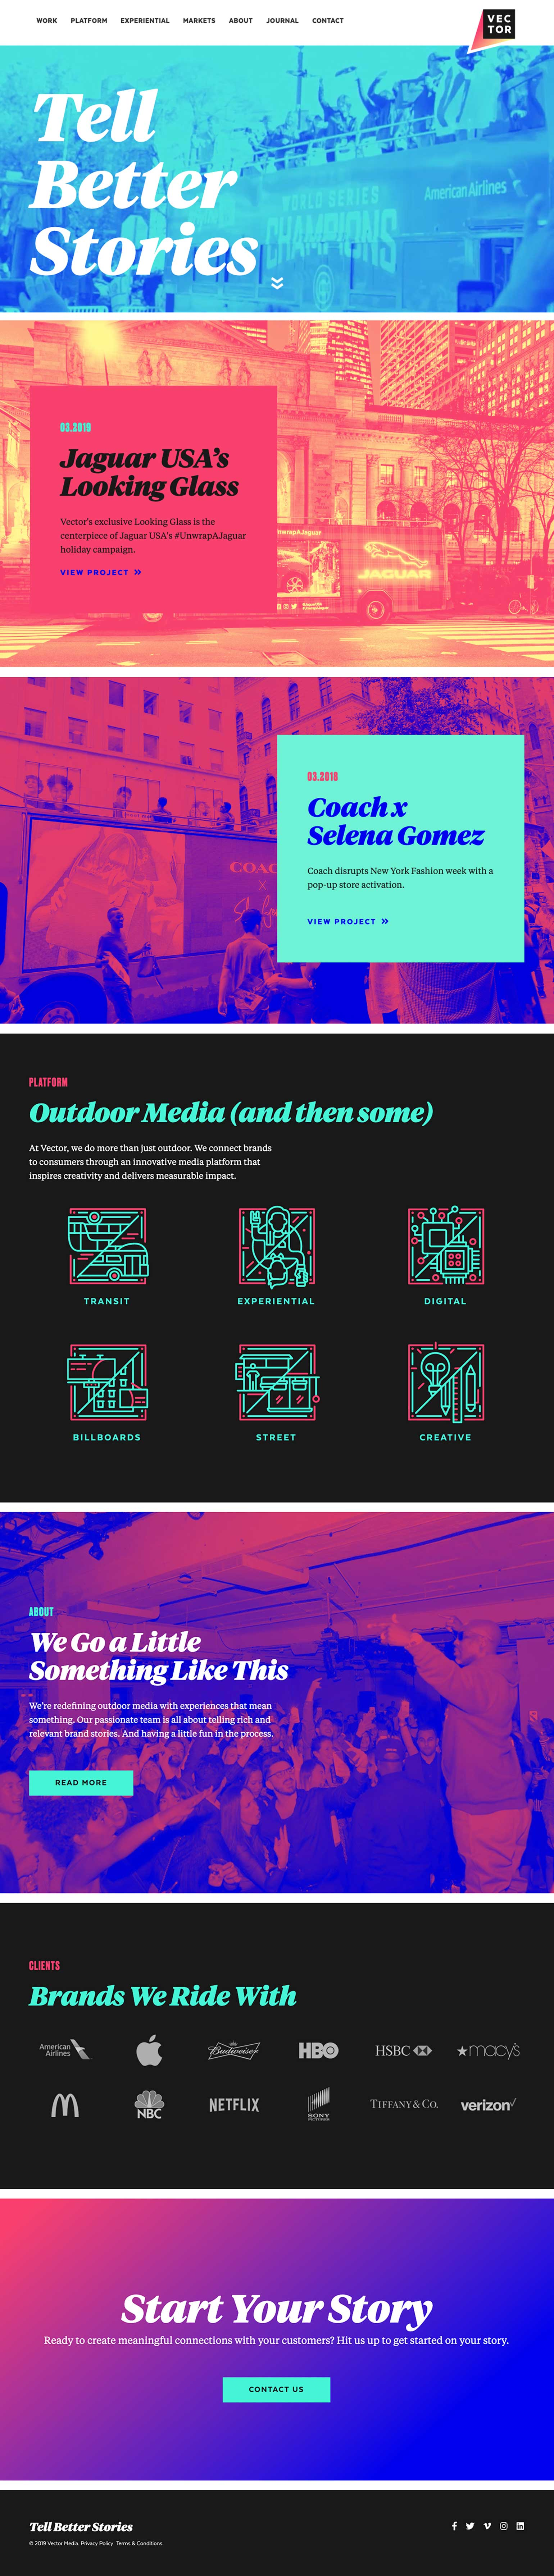 ignyte-branding-agency-web-design-vector-media-home-page-desktop-V7